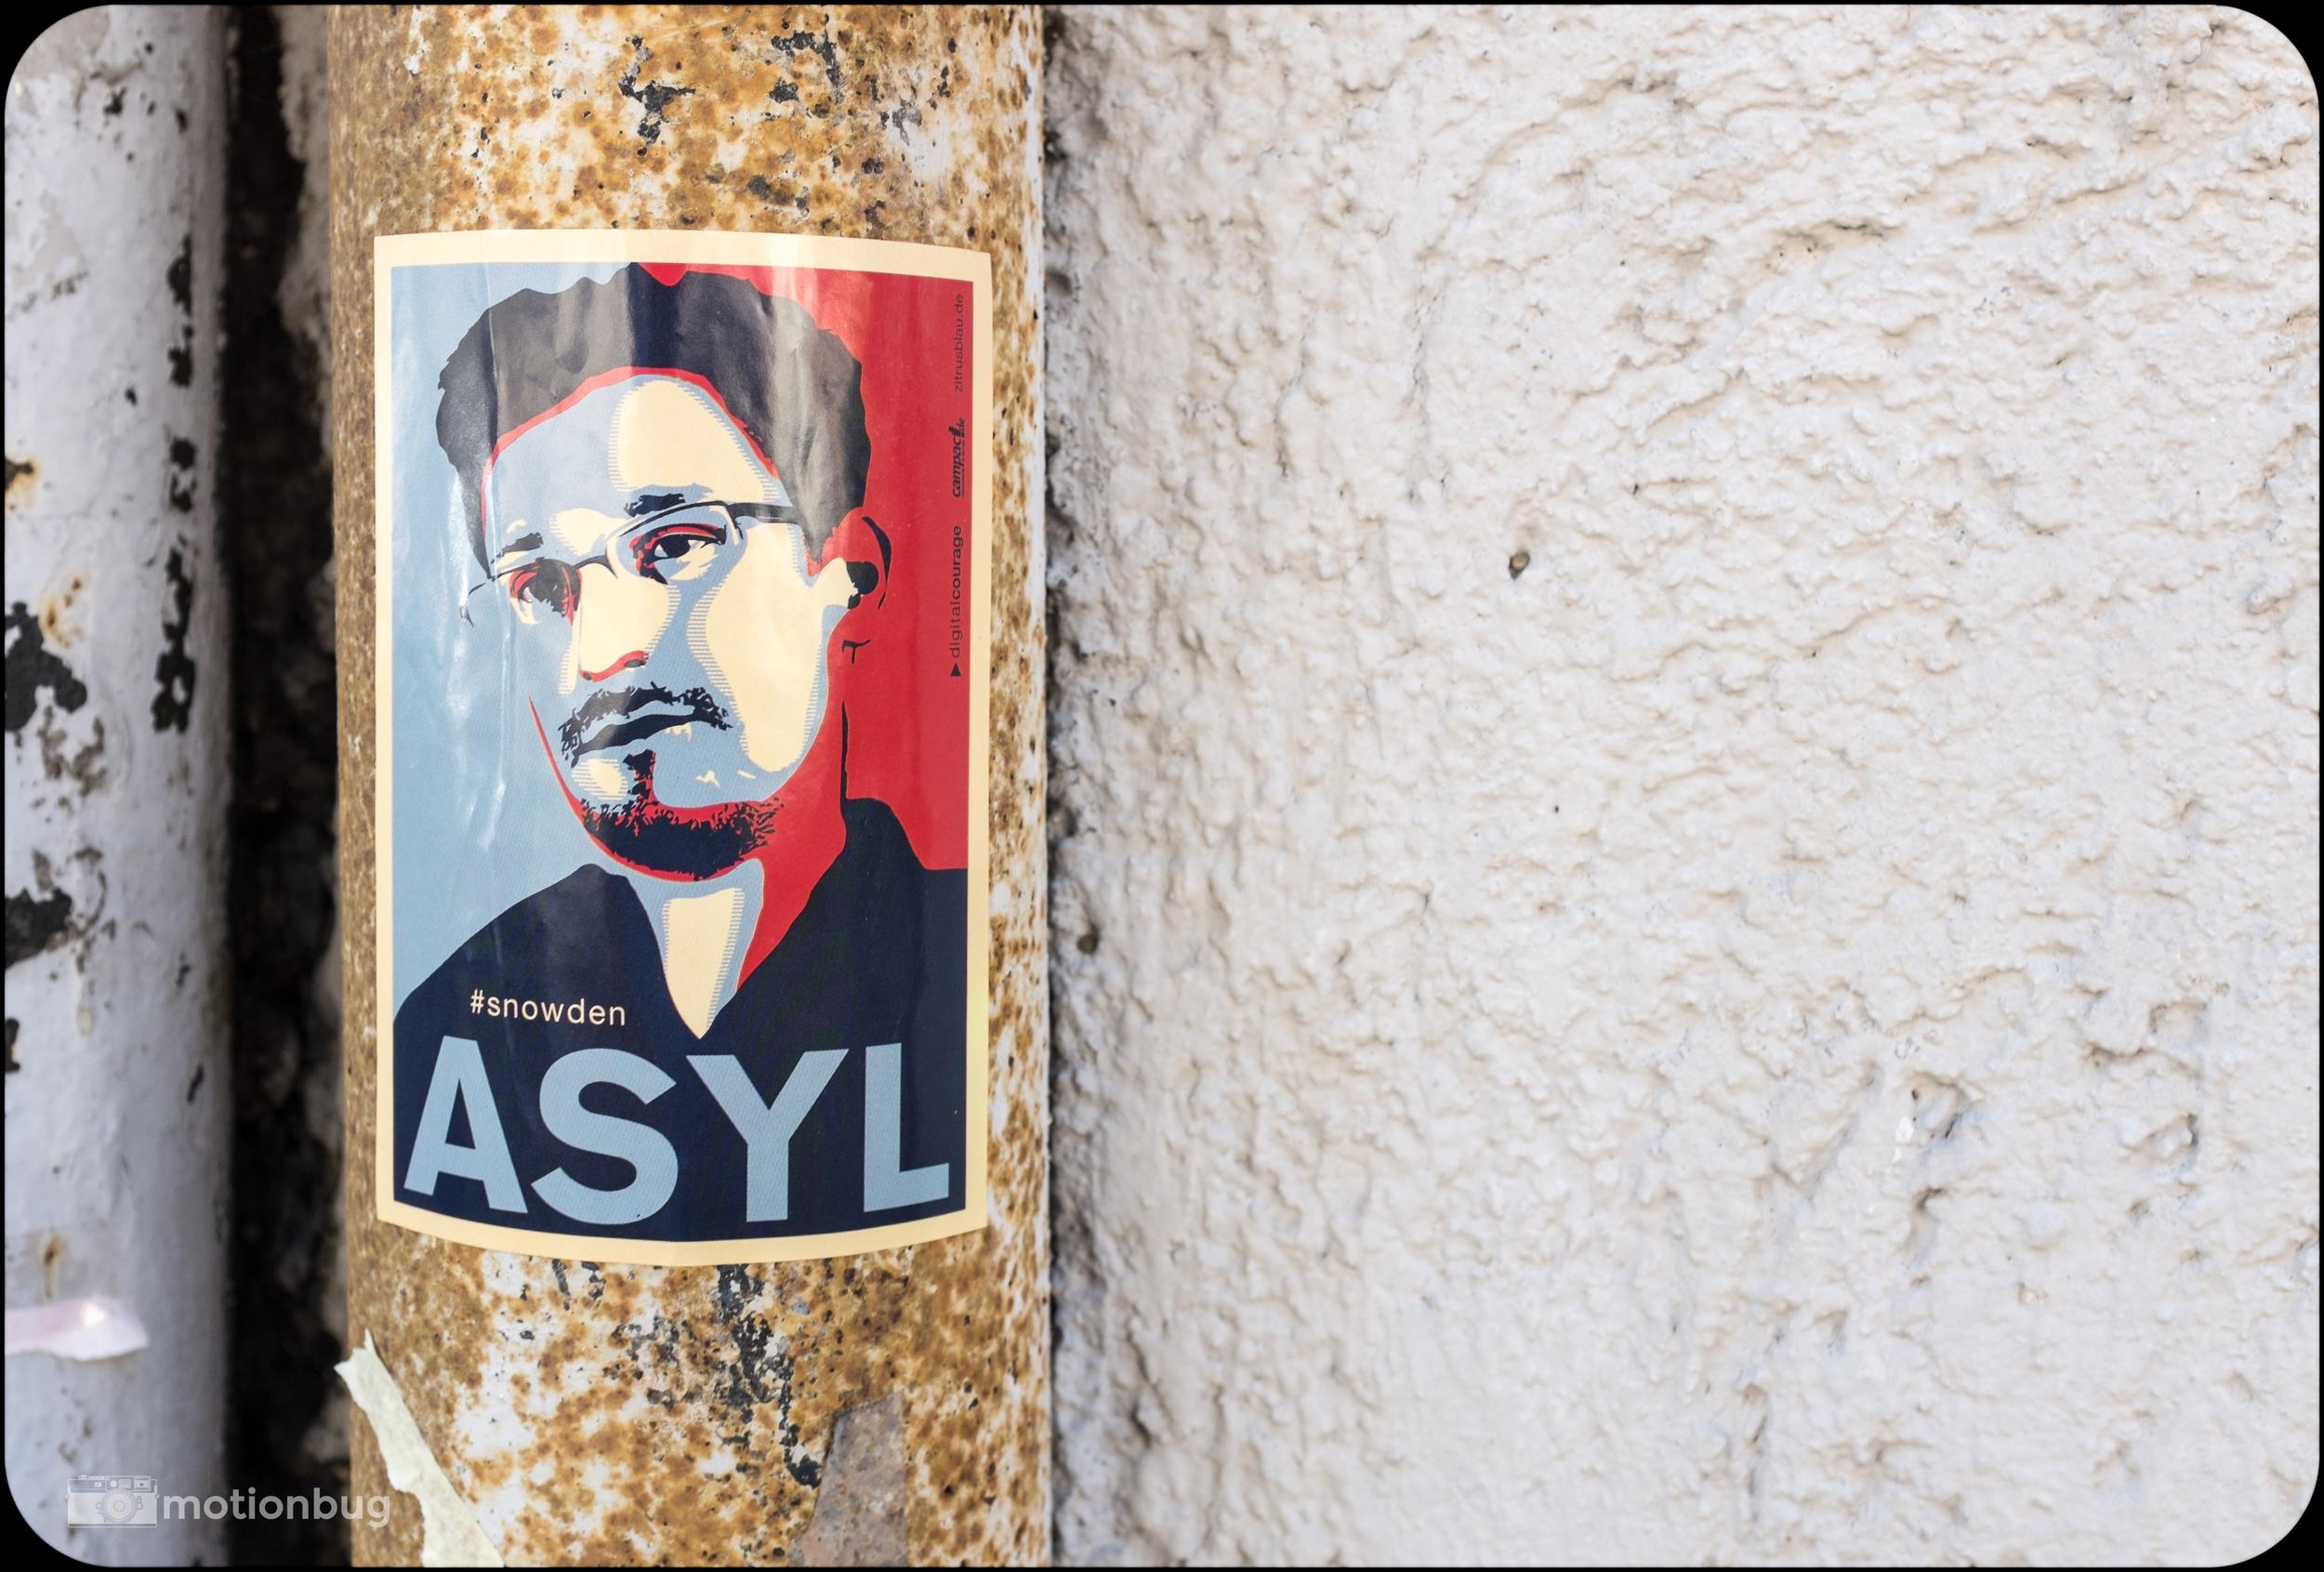 Assuming ASYL stands forasylum, it'sasylum for #snowden